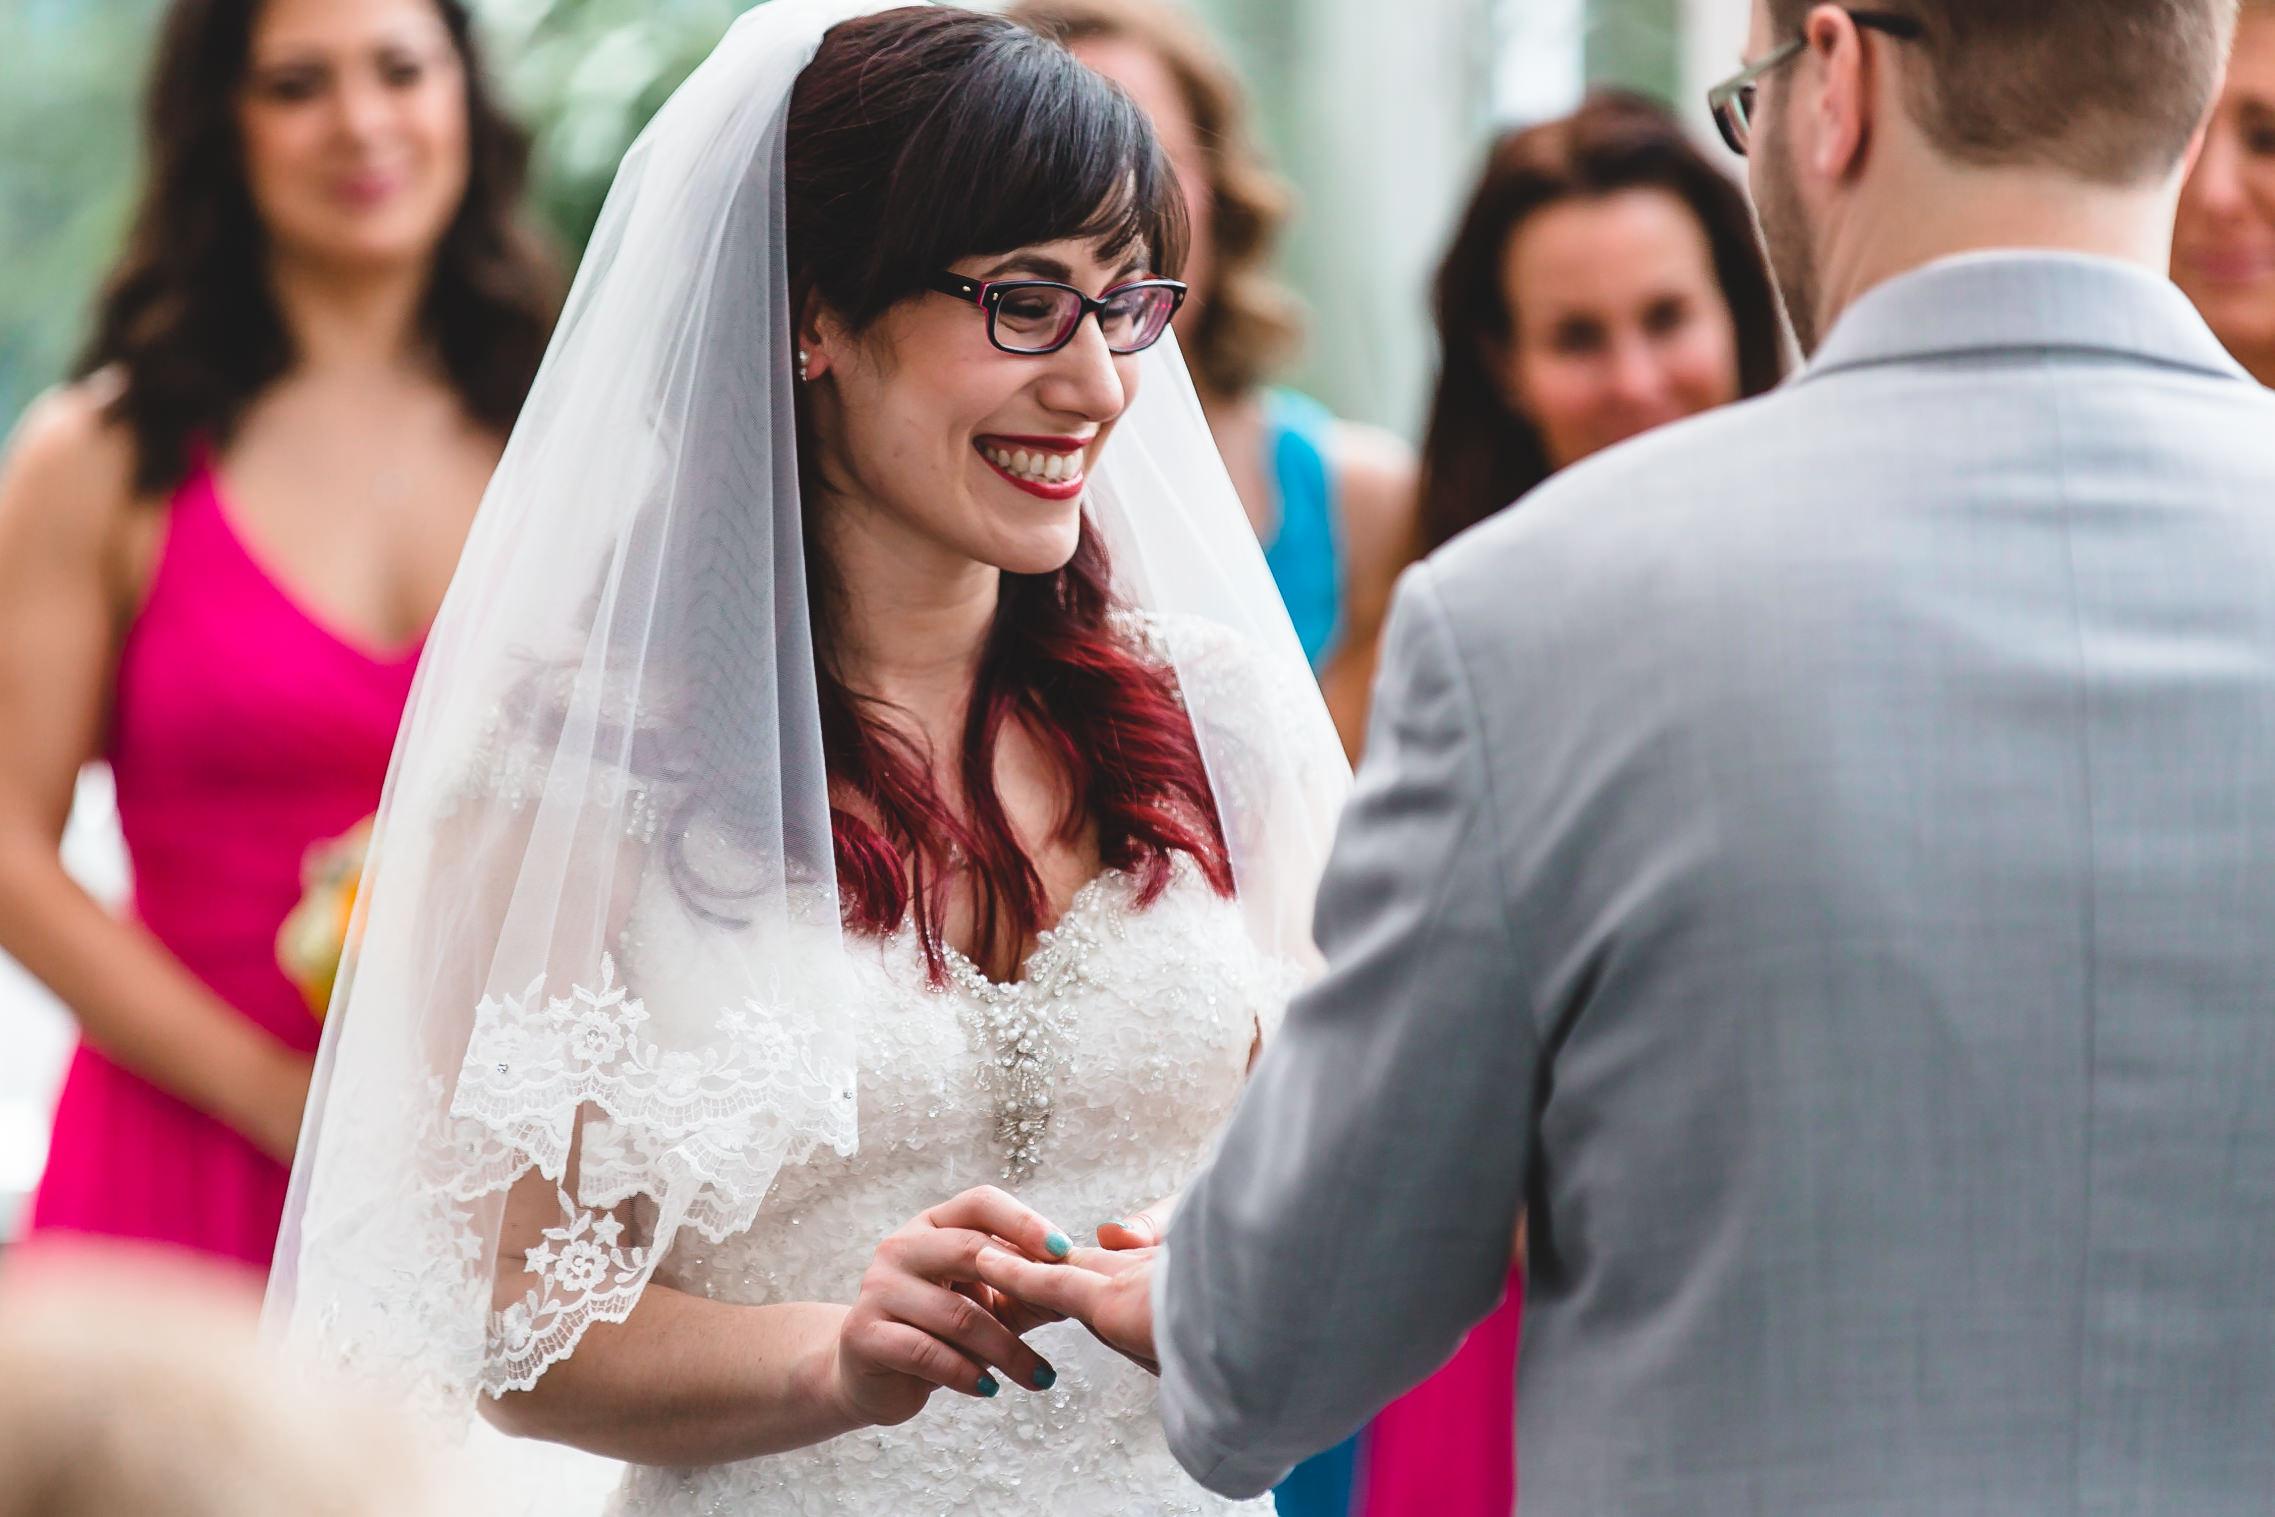 daniel_nydick_nj_photographer_headshot_wedding_event_family-12.jpg